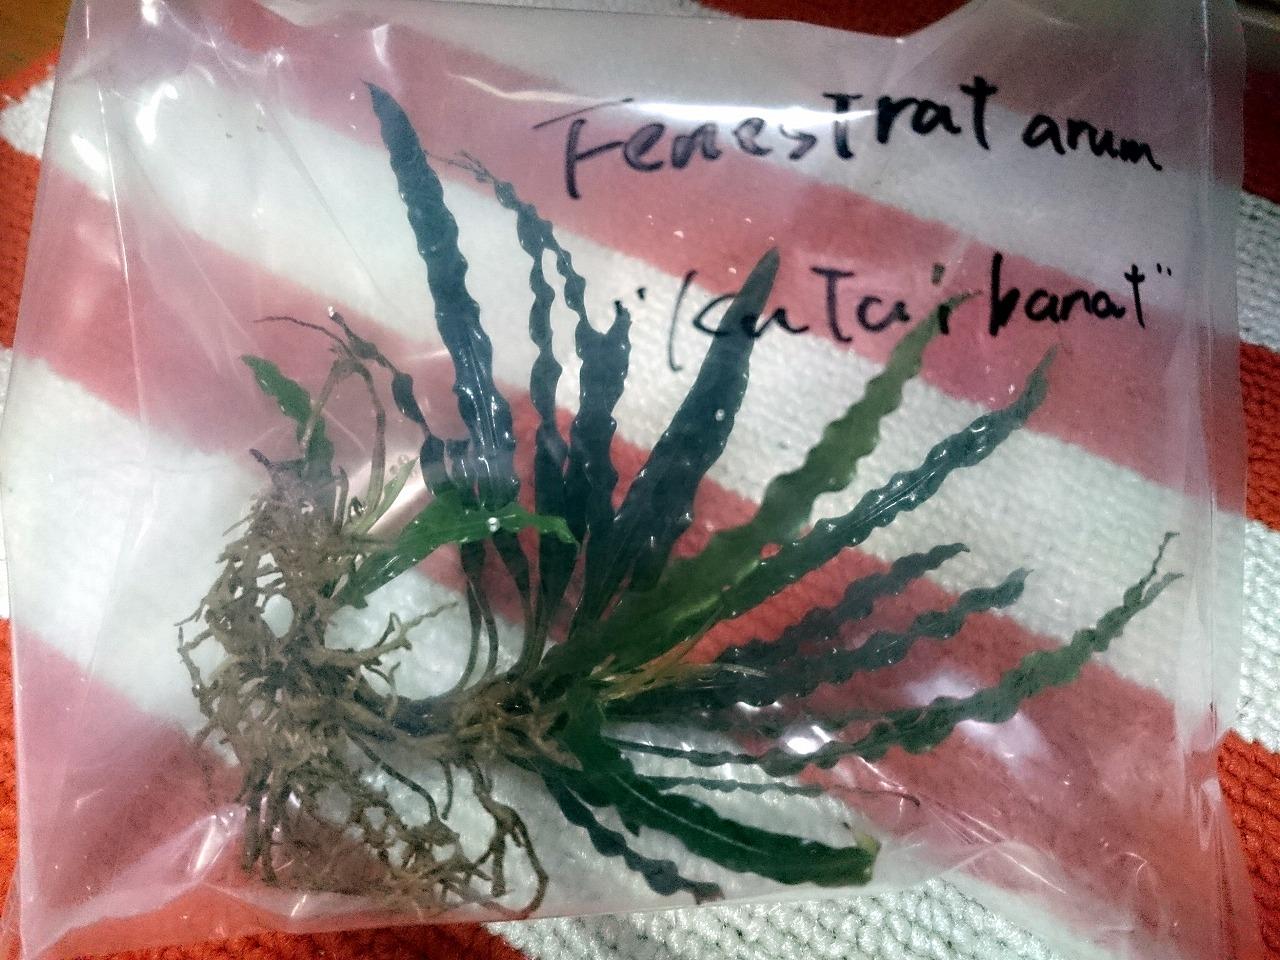 20150520-01_Fenestratarum-01.jpg